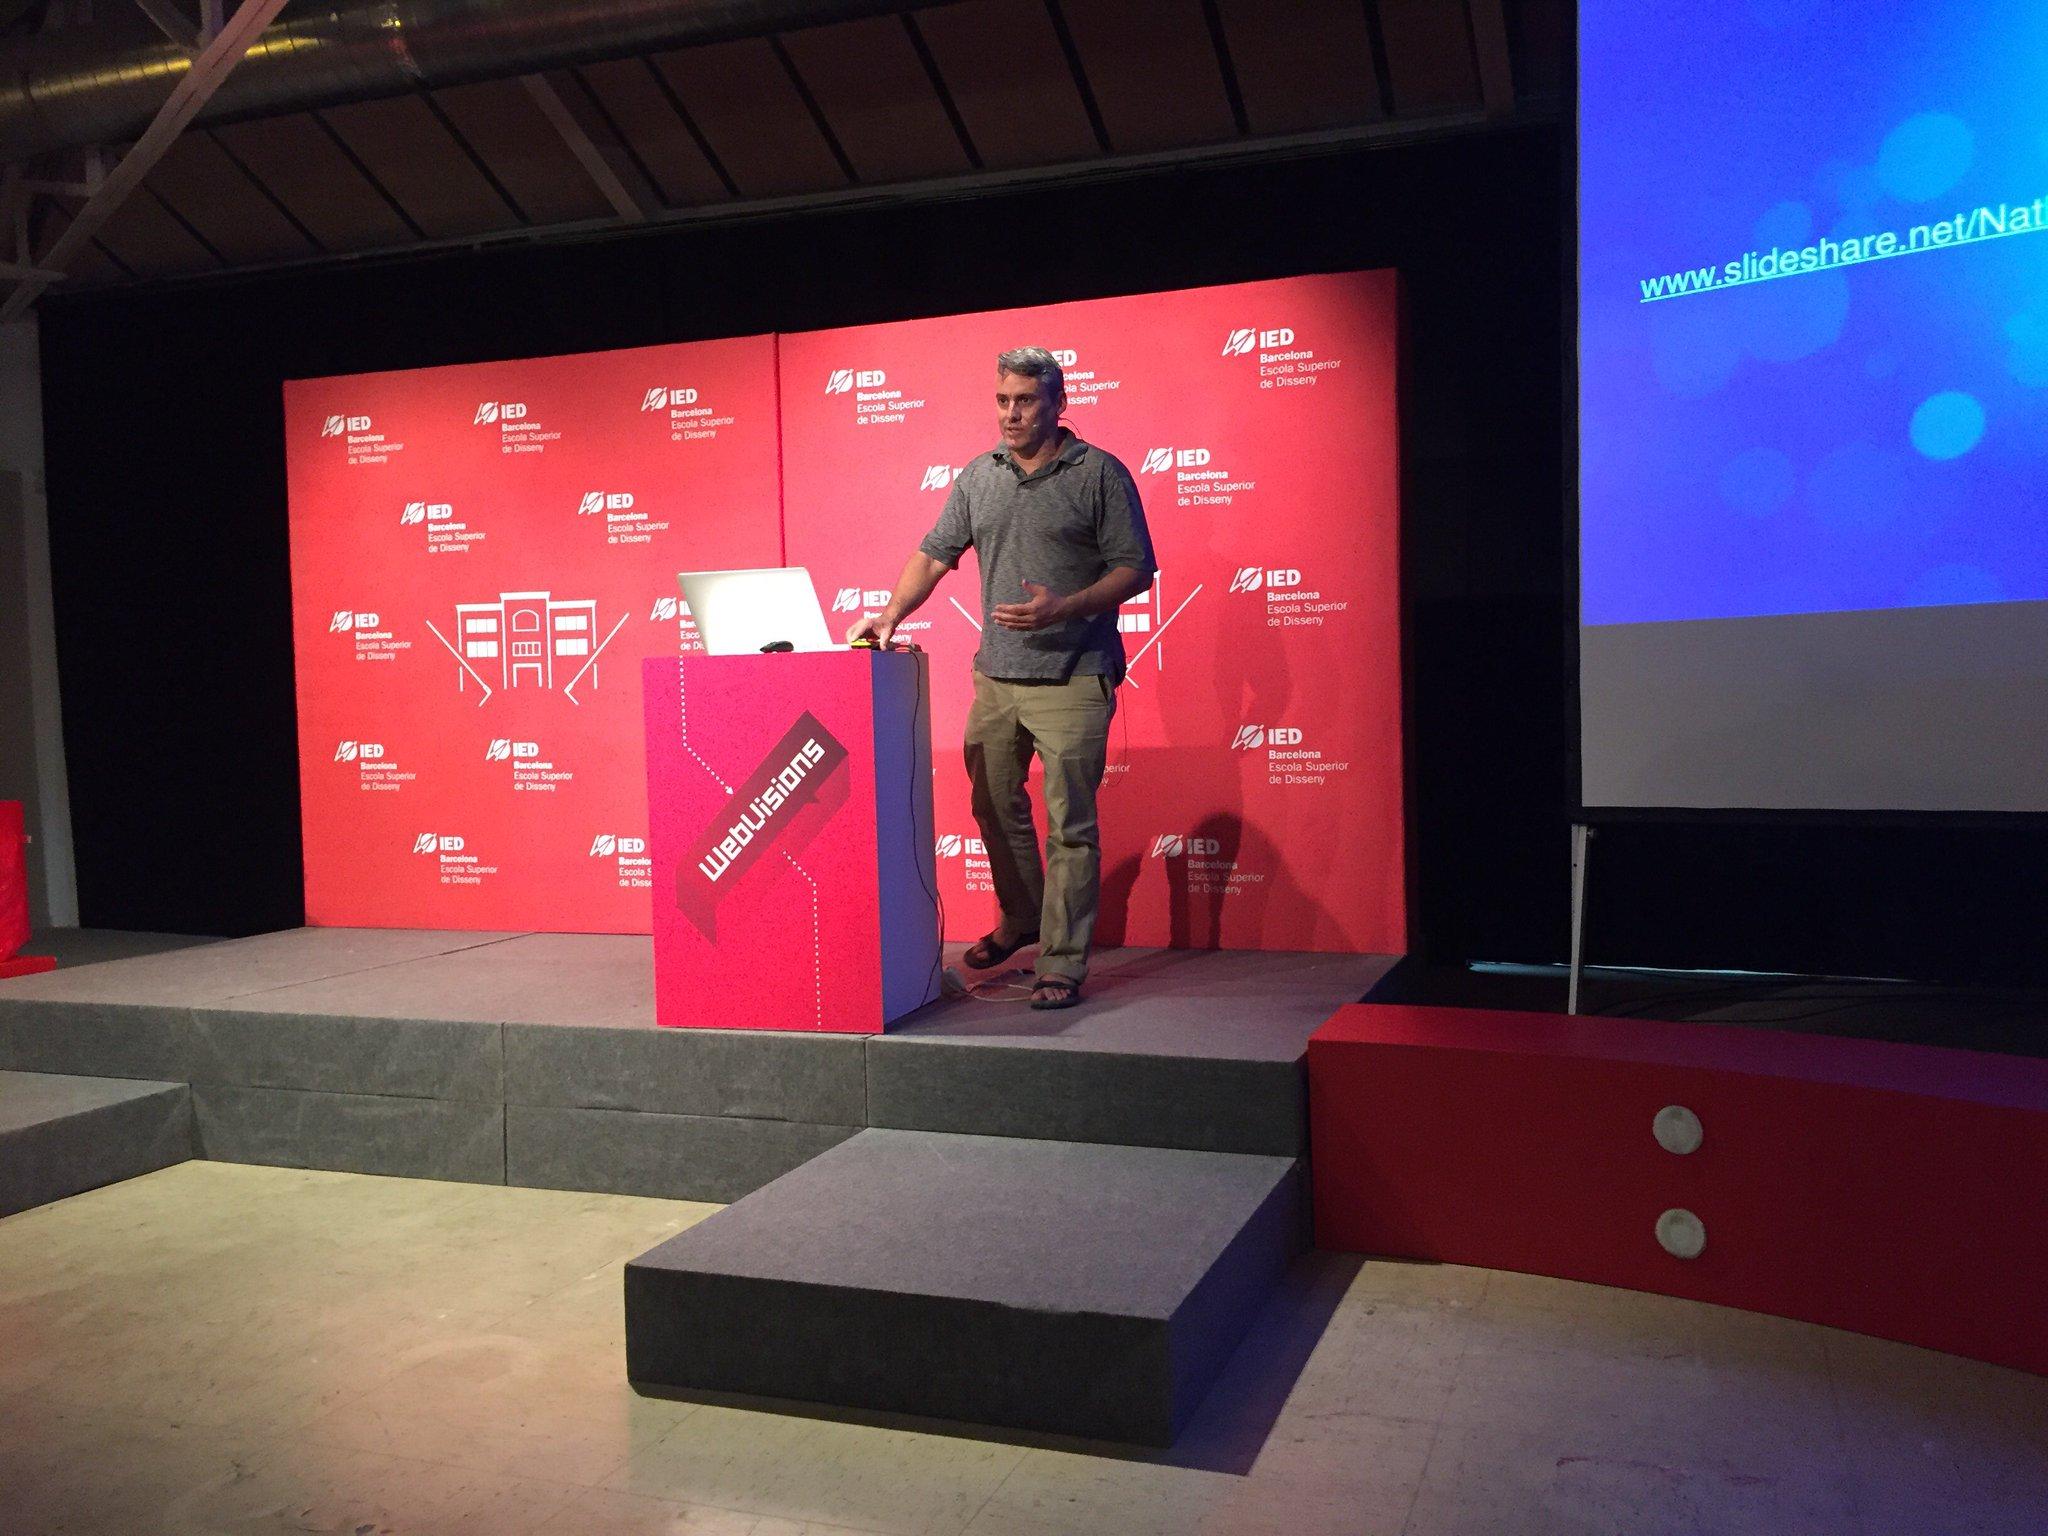 Kicking off #webvisions Barcelona with @nathanshedroff at @iedbarcelona -- woot! https://t.co/gFTfBCJ4Ip